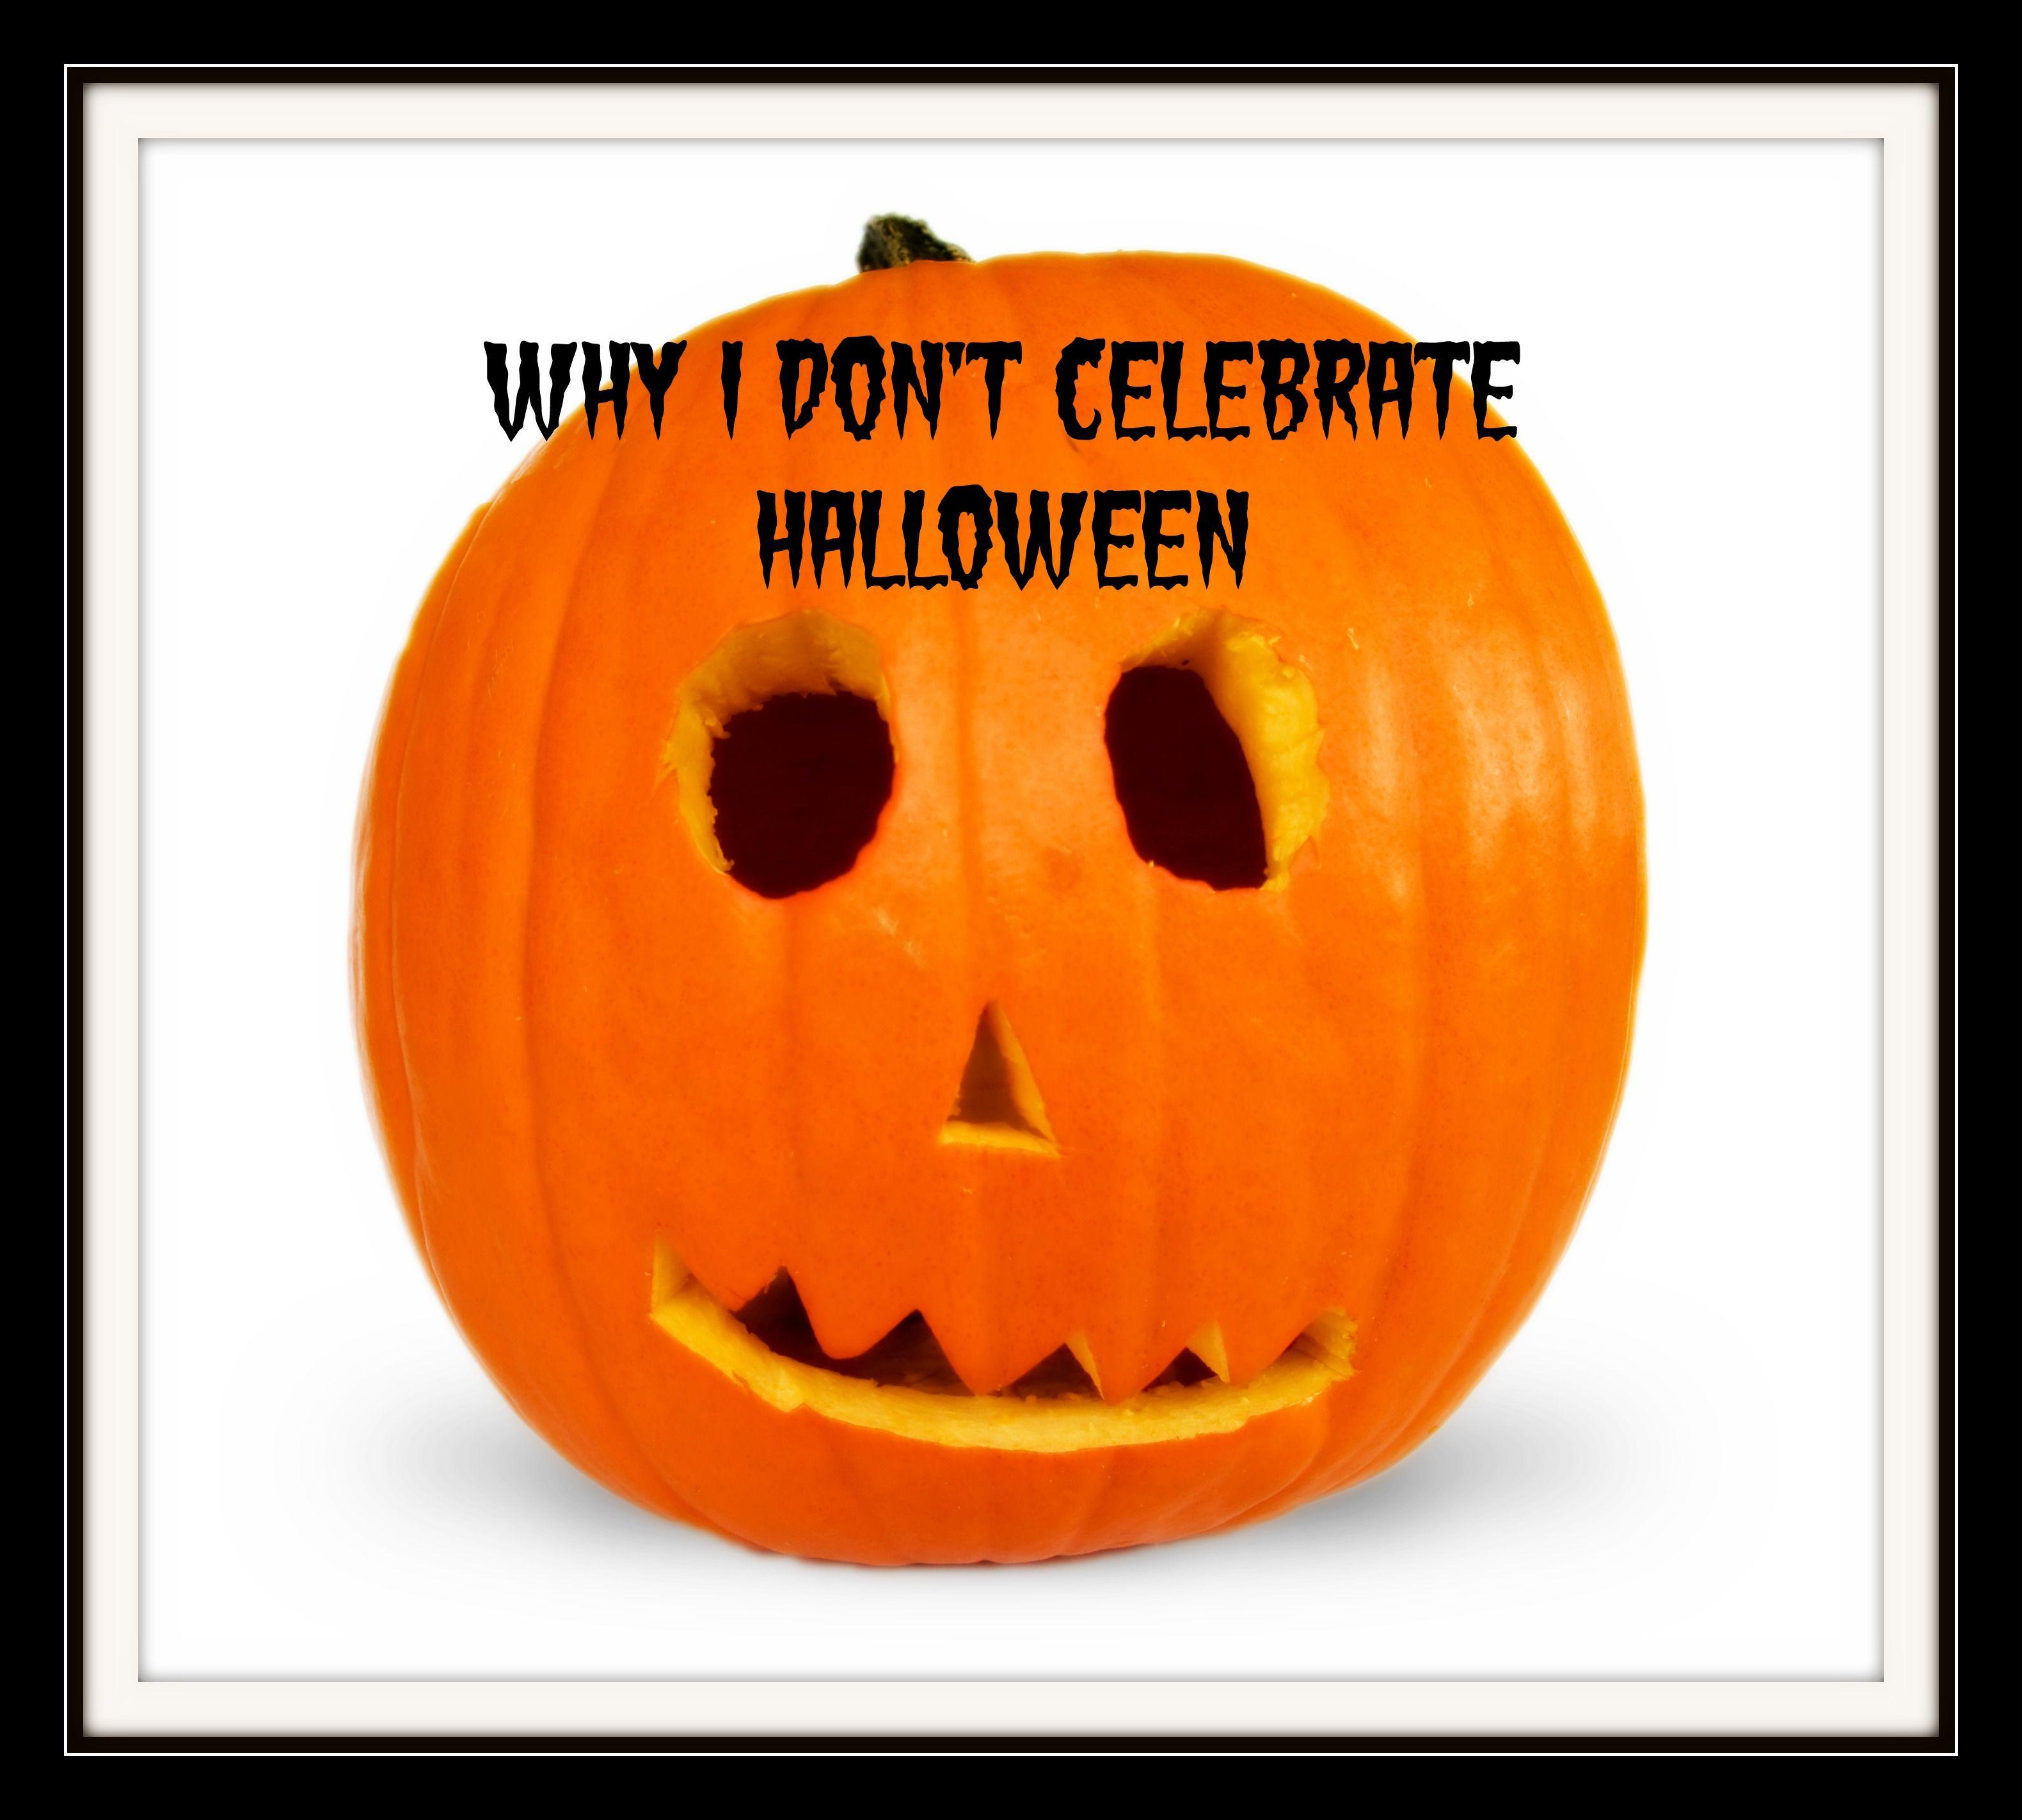 Why I Don't Celebrate Halloween. Halloween alternatives